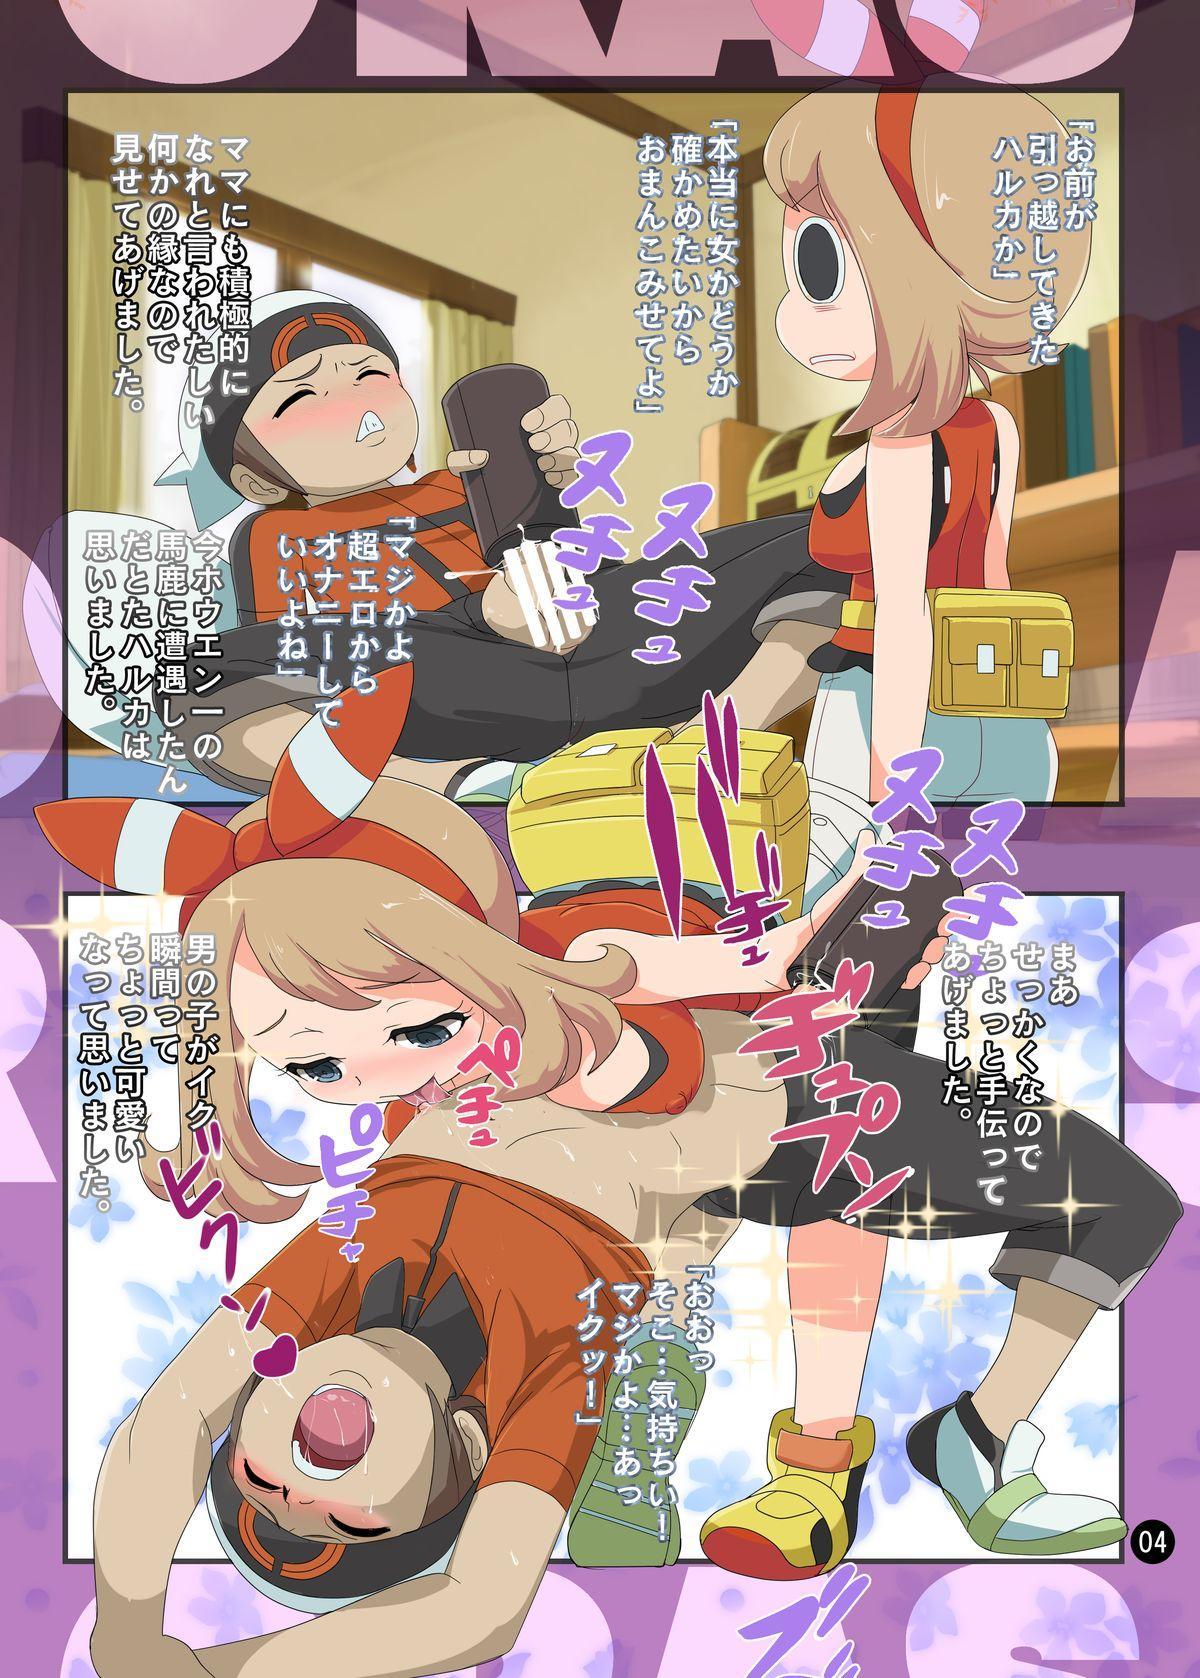 IkuIku Charii GOGO 2